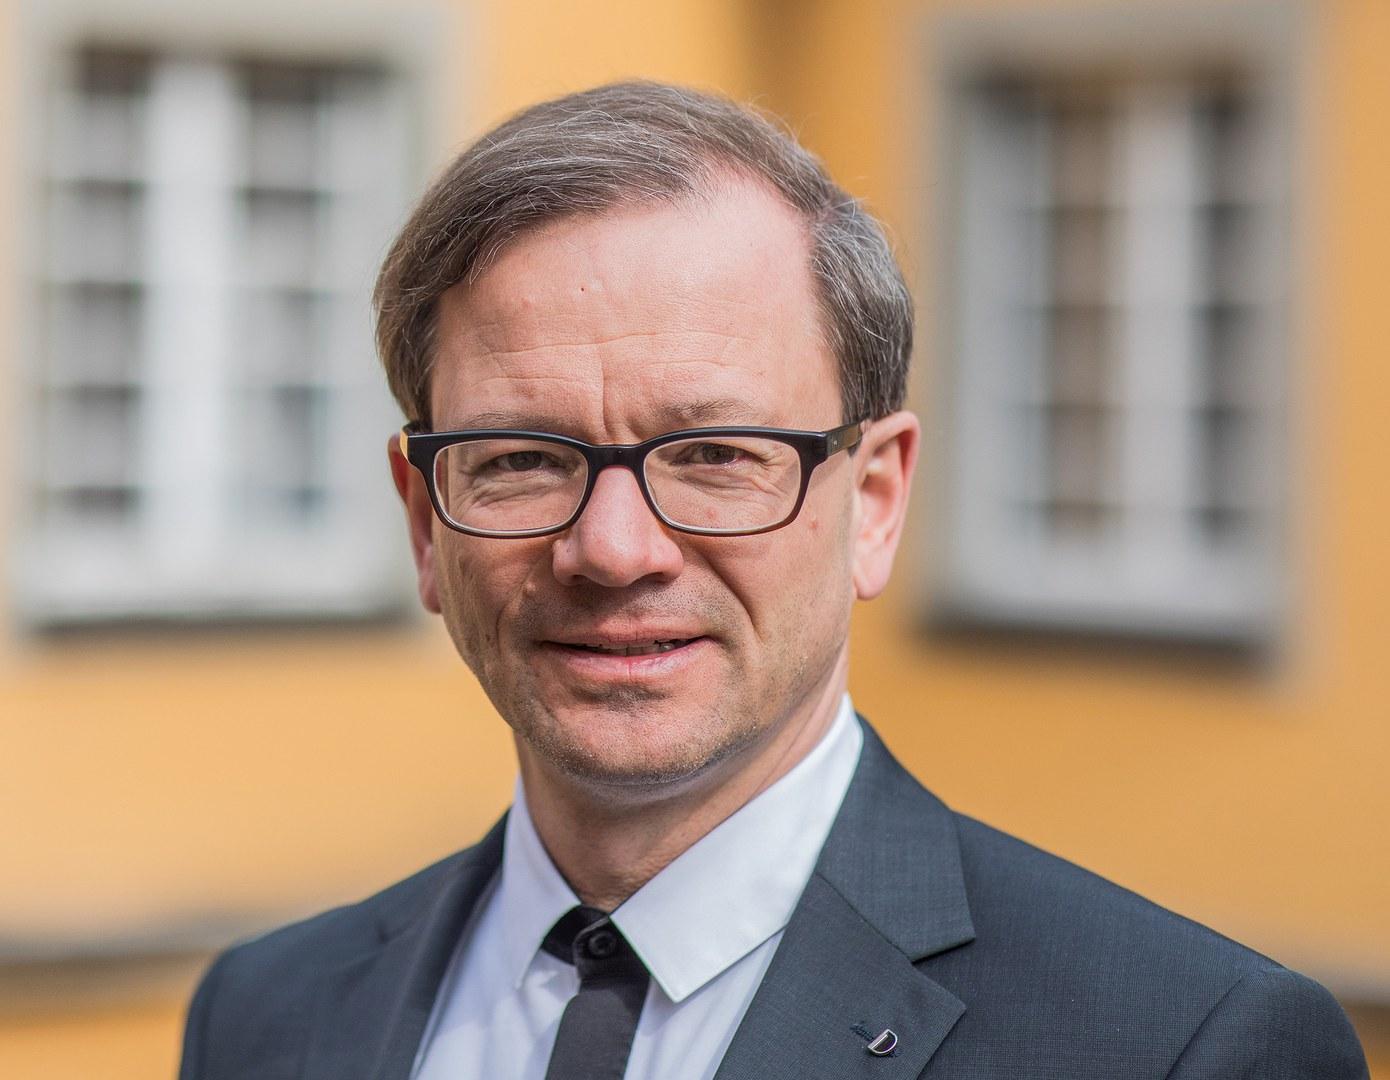 Prof. Dr. Christoph Zuschlag